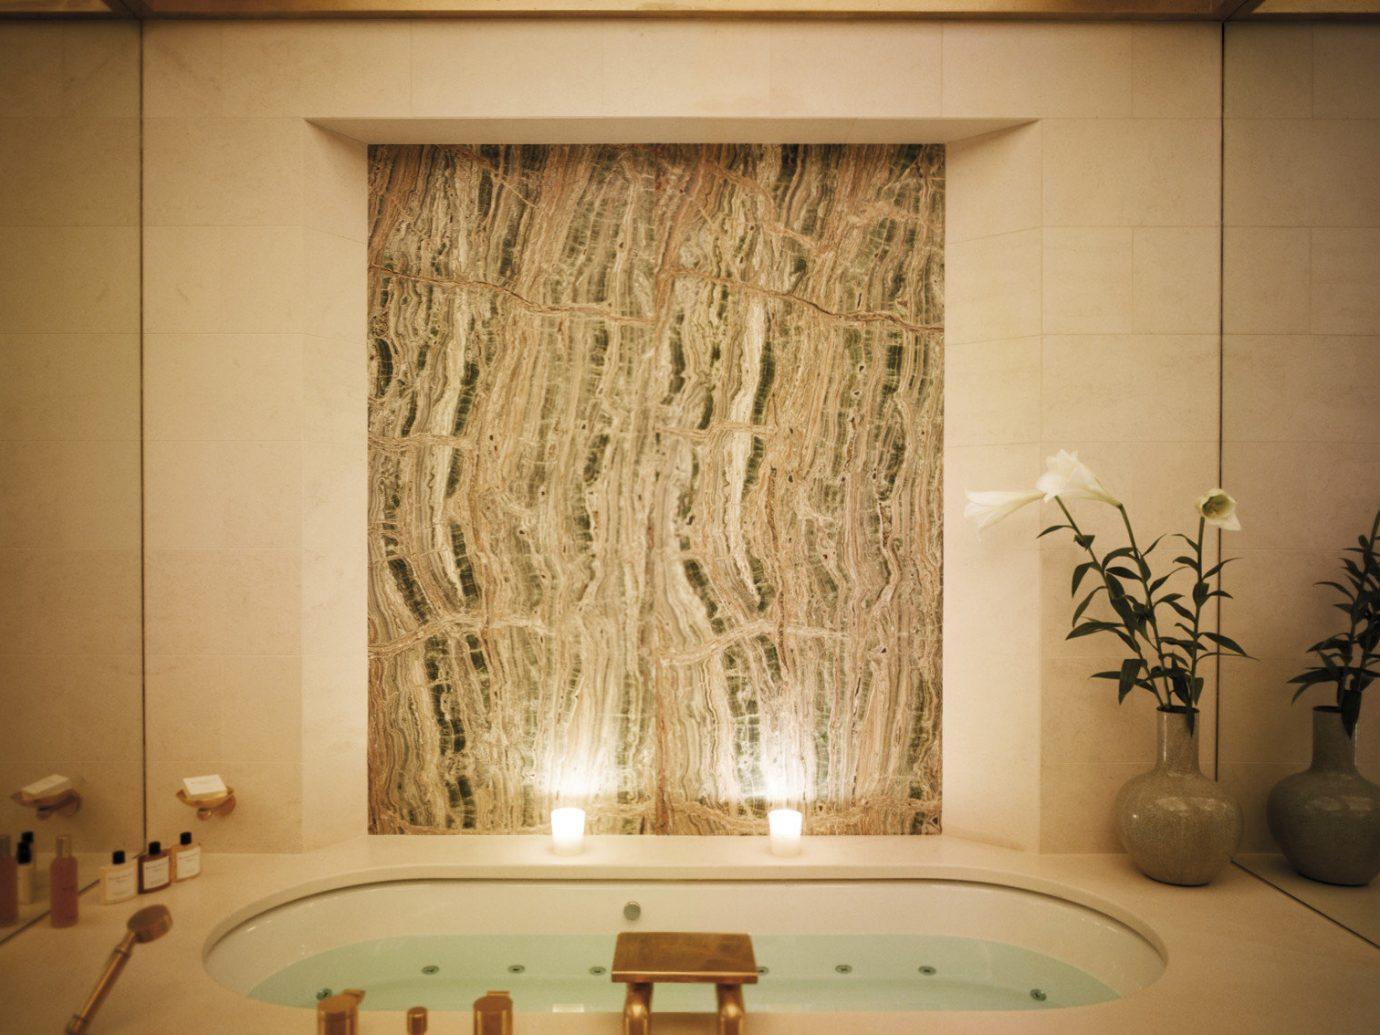 Hotels Luxury Travel wall bathroom indoor room interior design sink curtain window treatment window window covering flooring shade glass decor tub bathtub Bath tile tiled